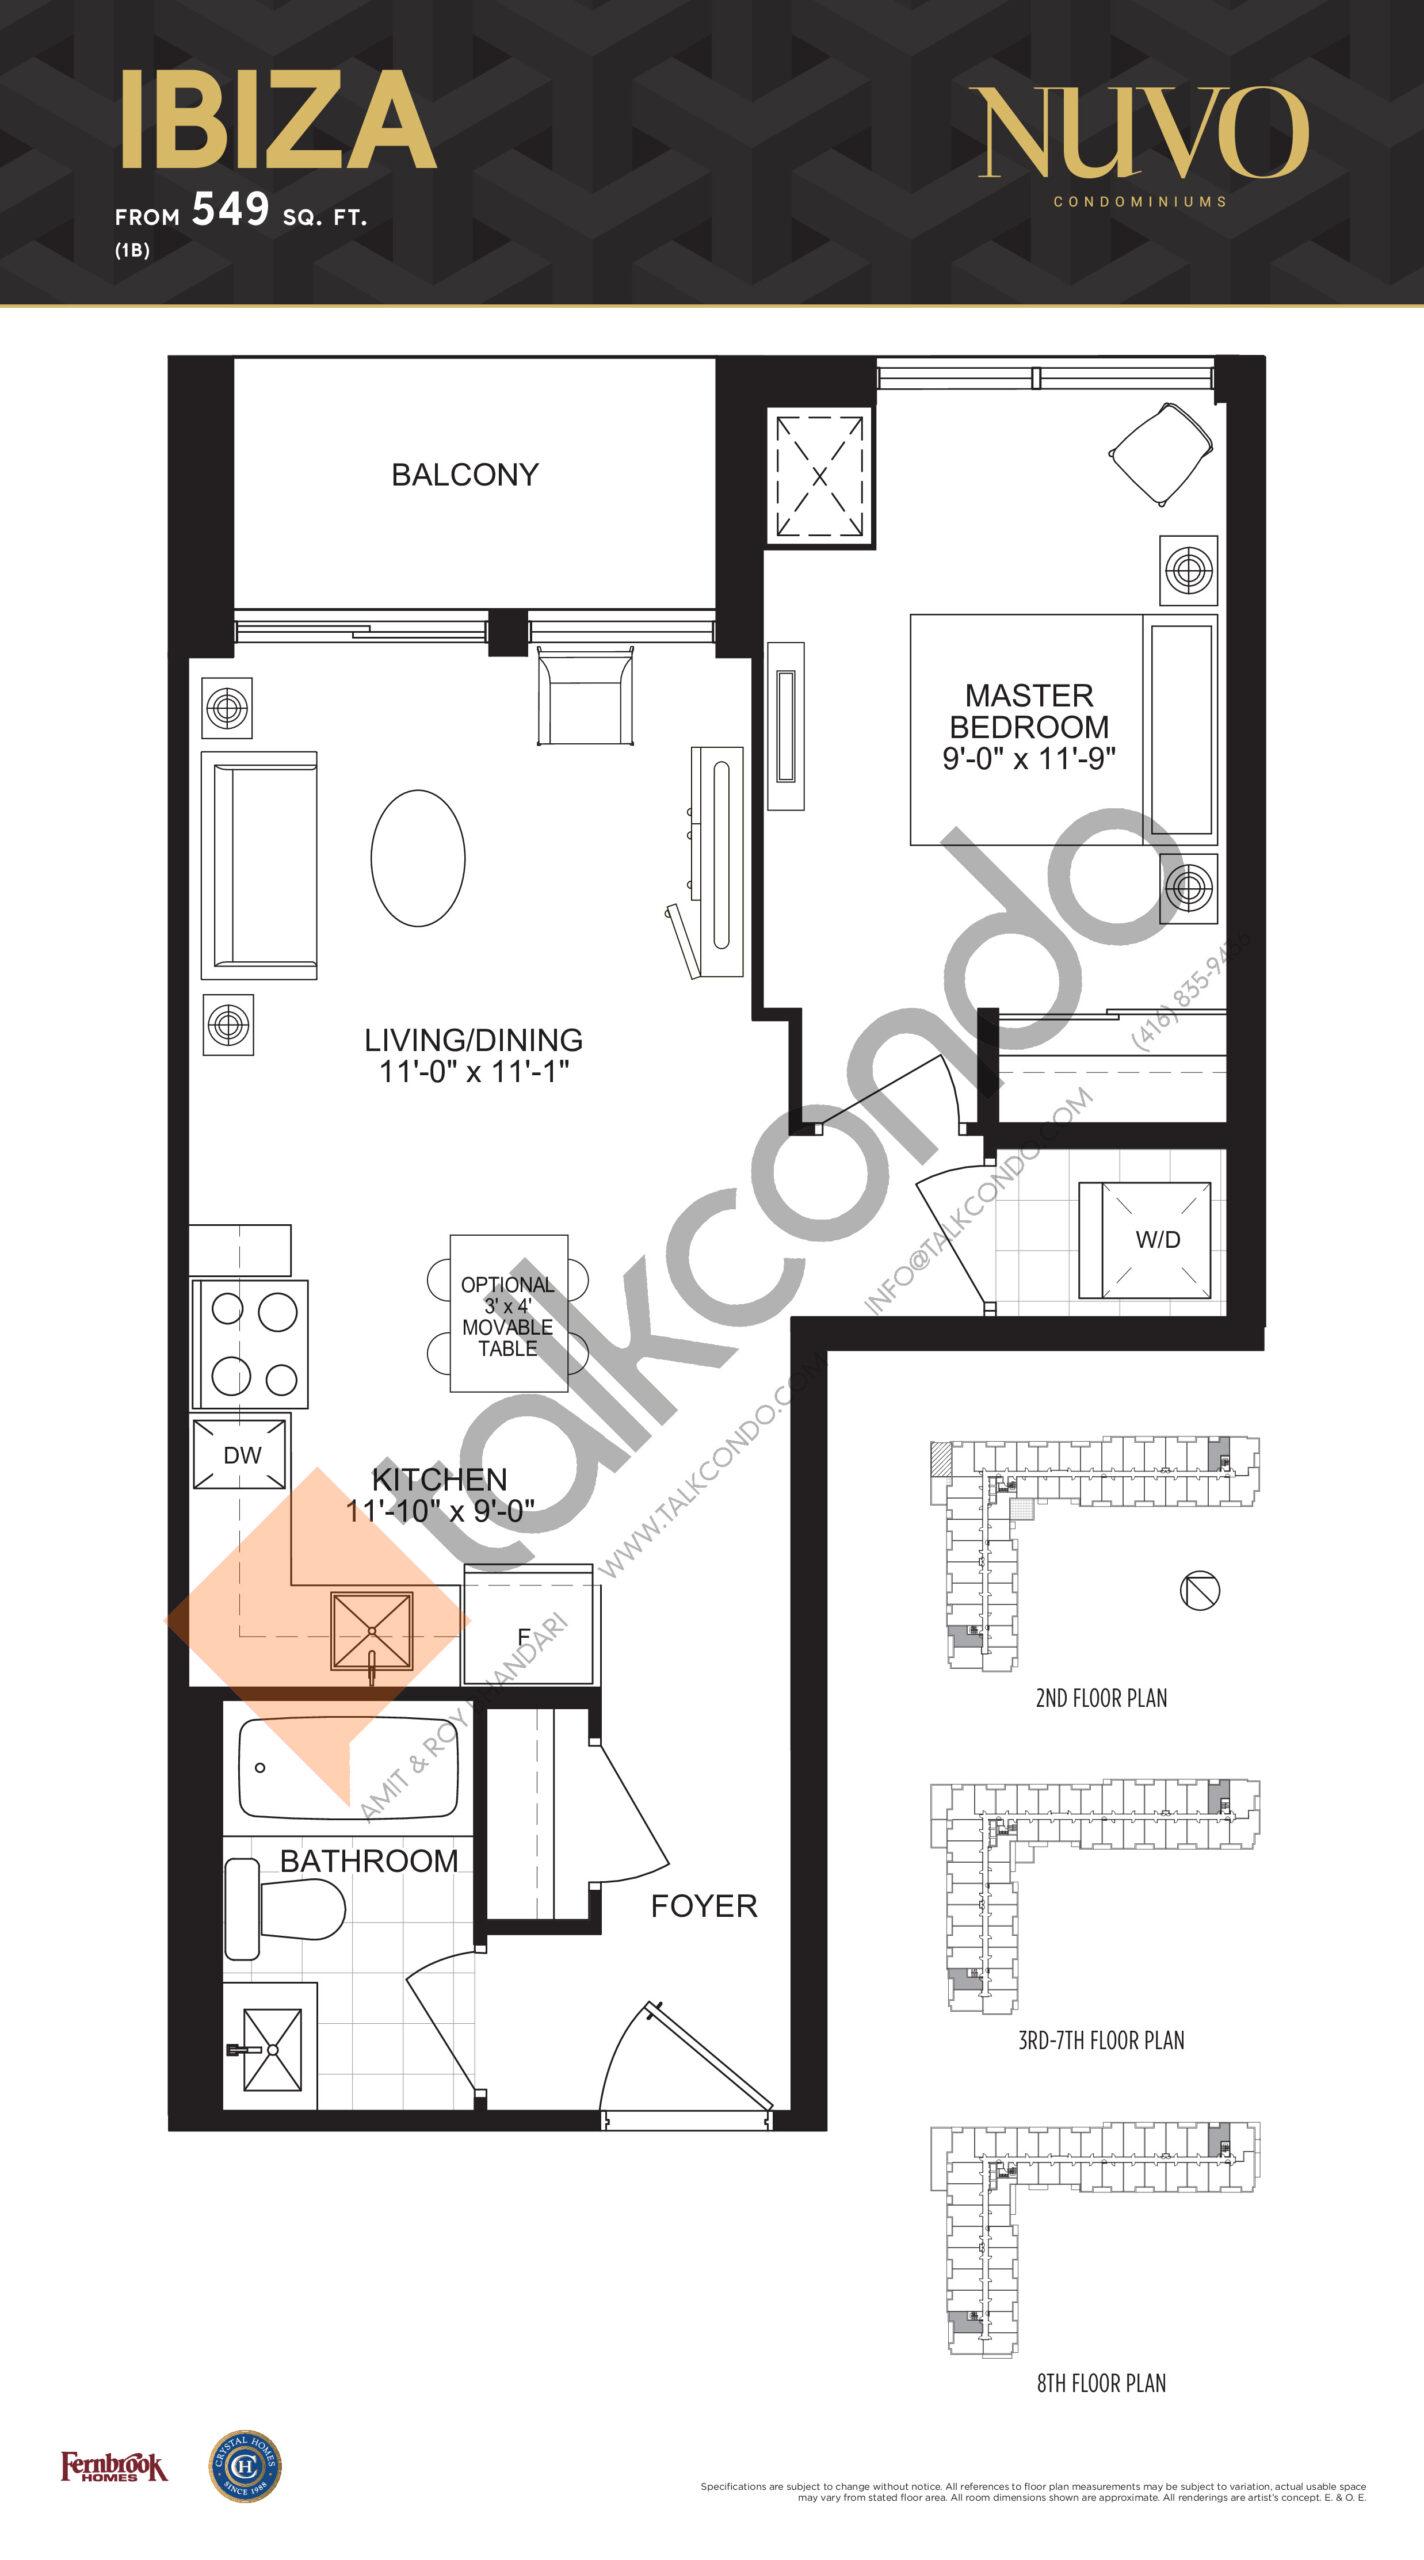 Ibiza Floor Plan at Nuvo Condos - 549 sq.ft